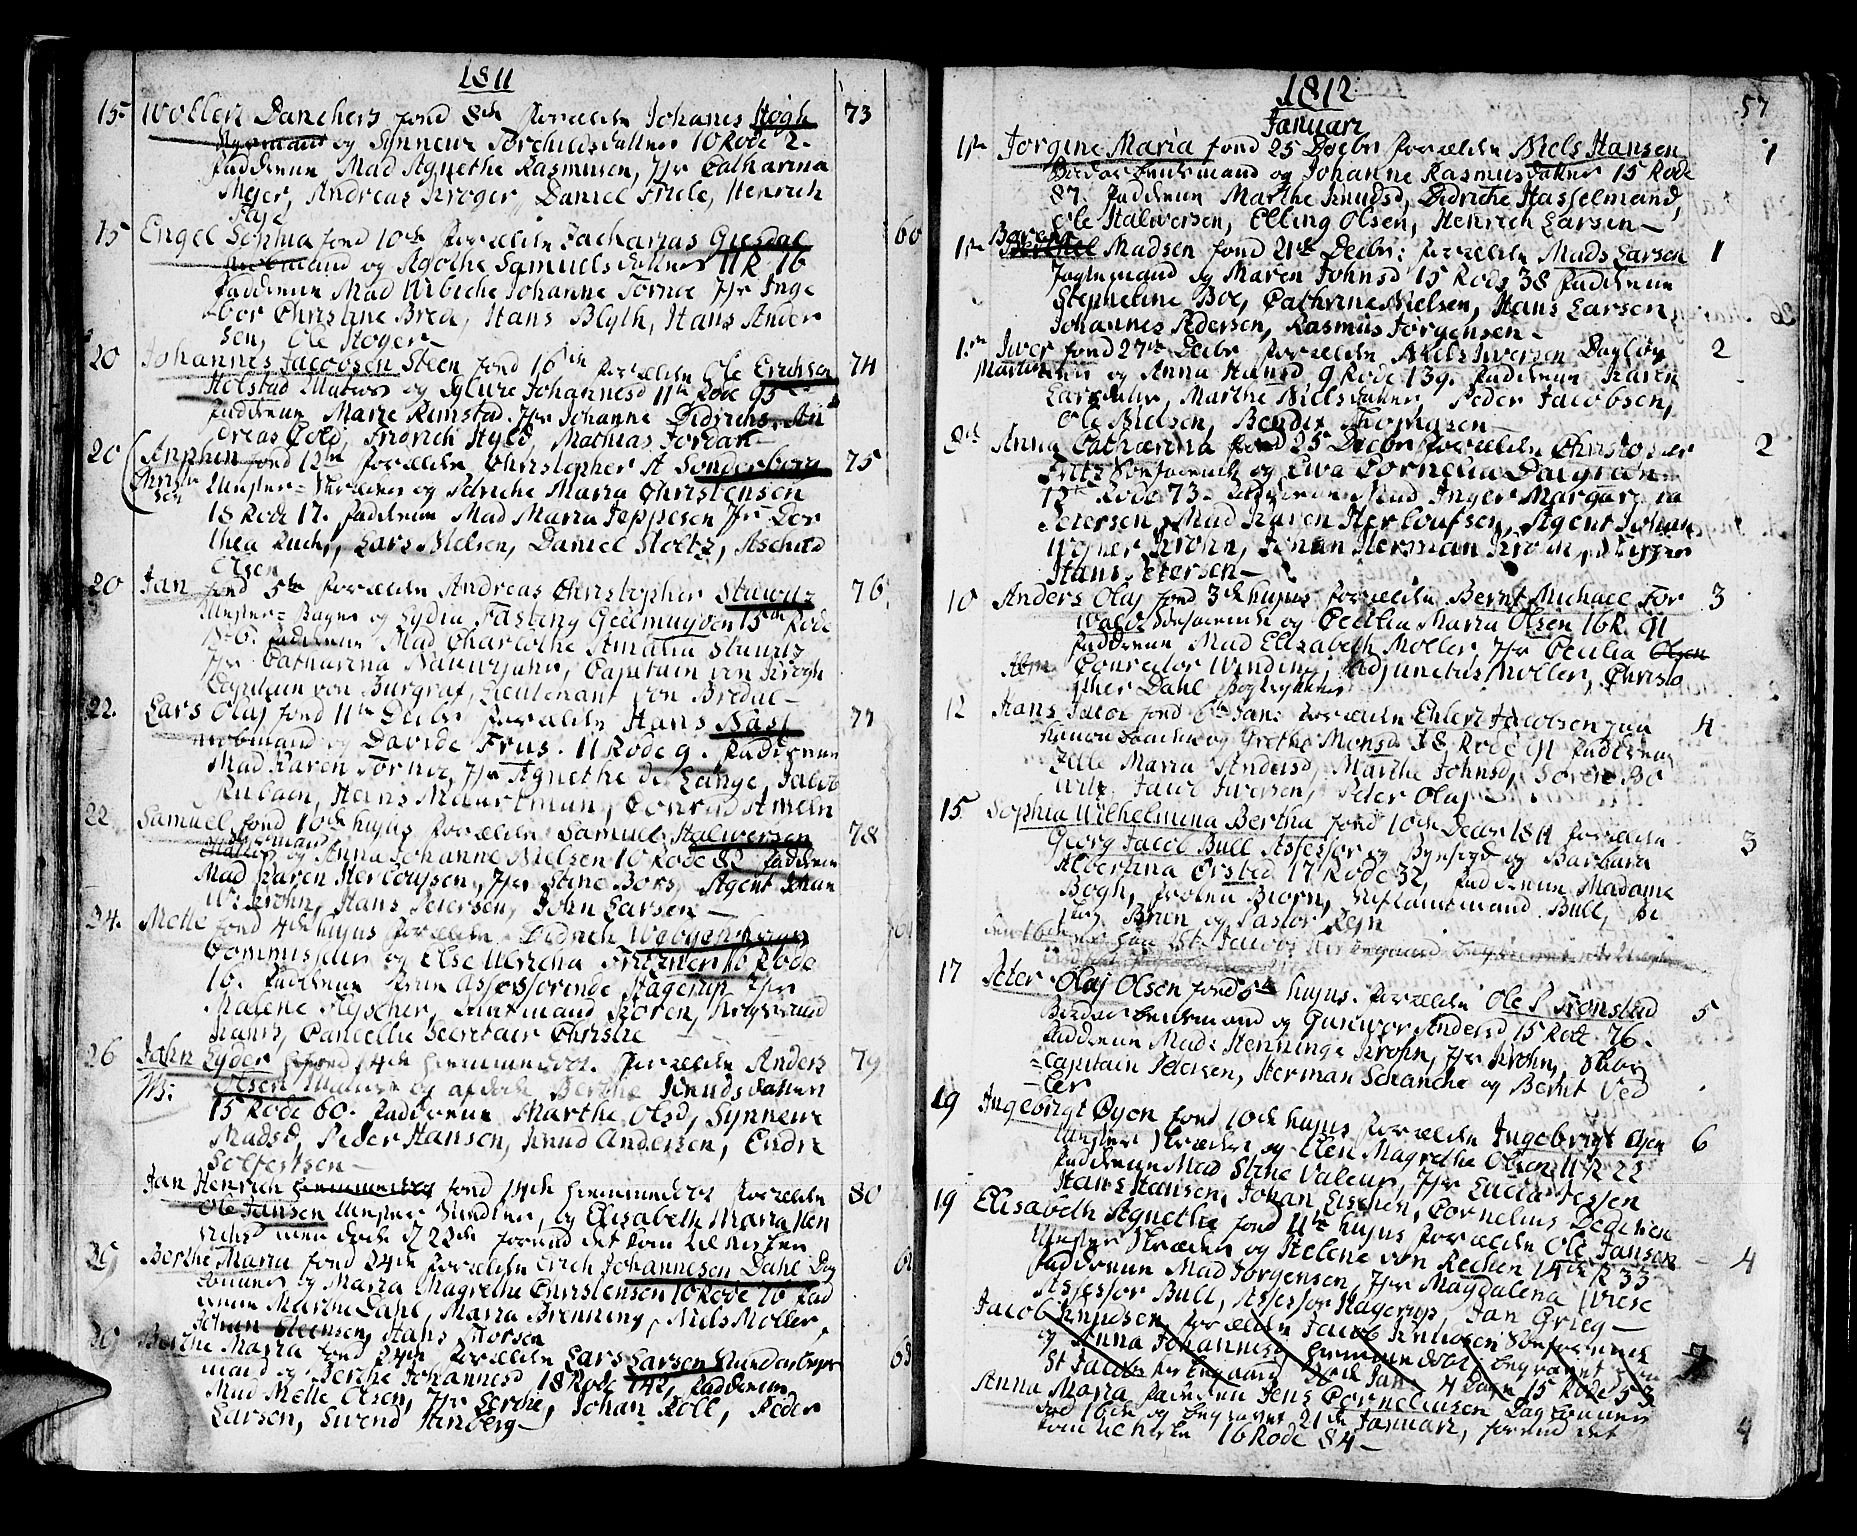 SAB, Domkirken Sokneprestembete, H/Haa/L0005: Ministerialbok nr. A 5, 1808-1820, s. 56-57